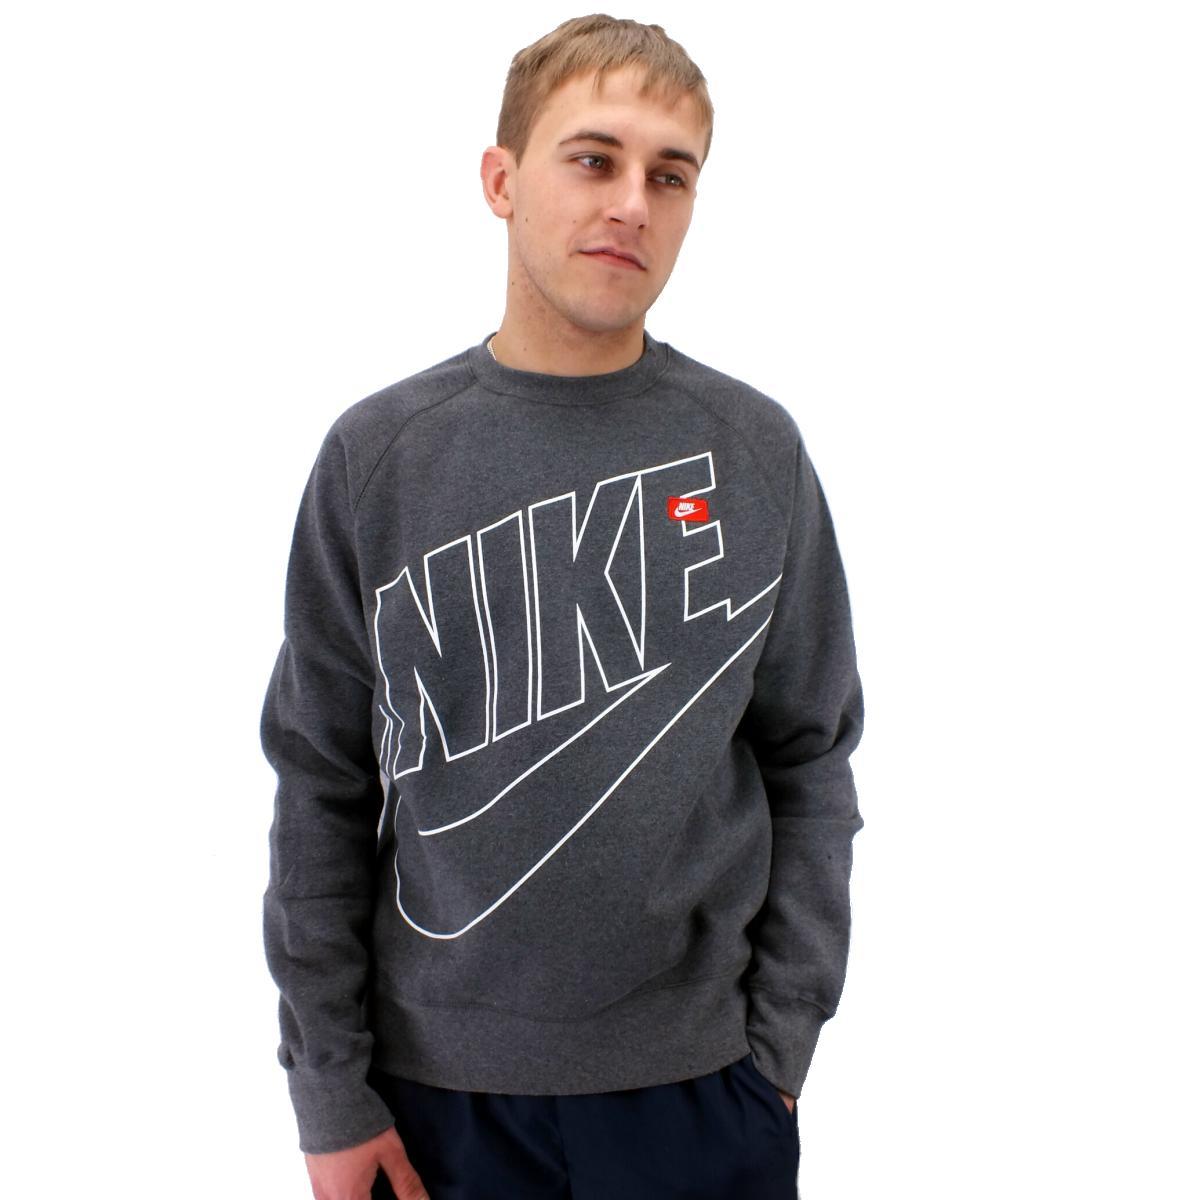 nike aw77 ace fleece crew logo herren pullover sweatshirt fleece diverse farben ebay. Black Bedroom Furniture Sets. Home Design Ideas